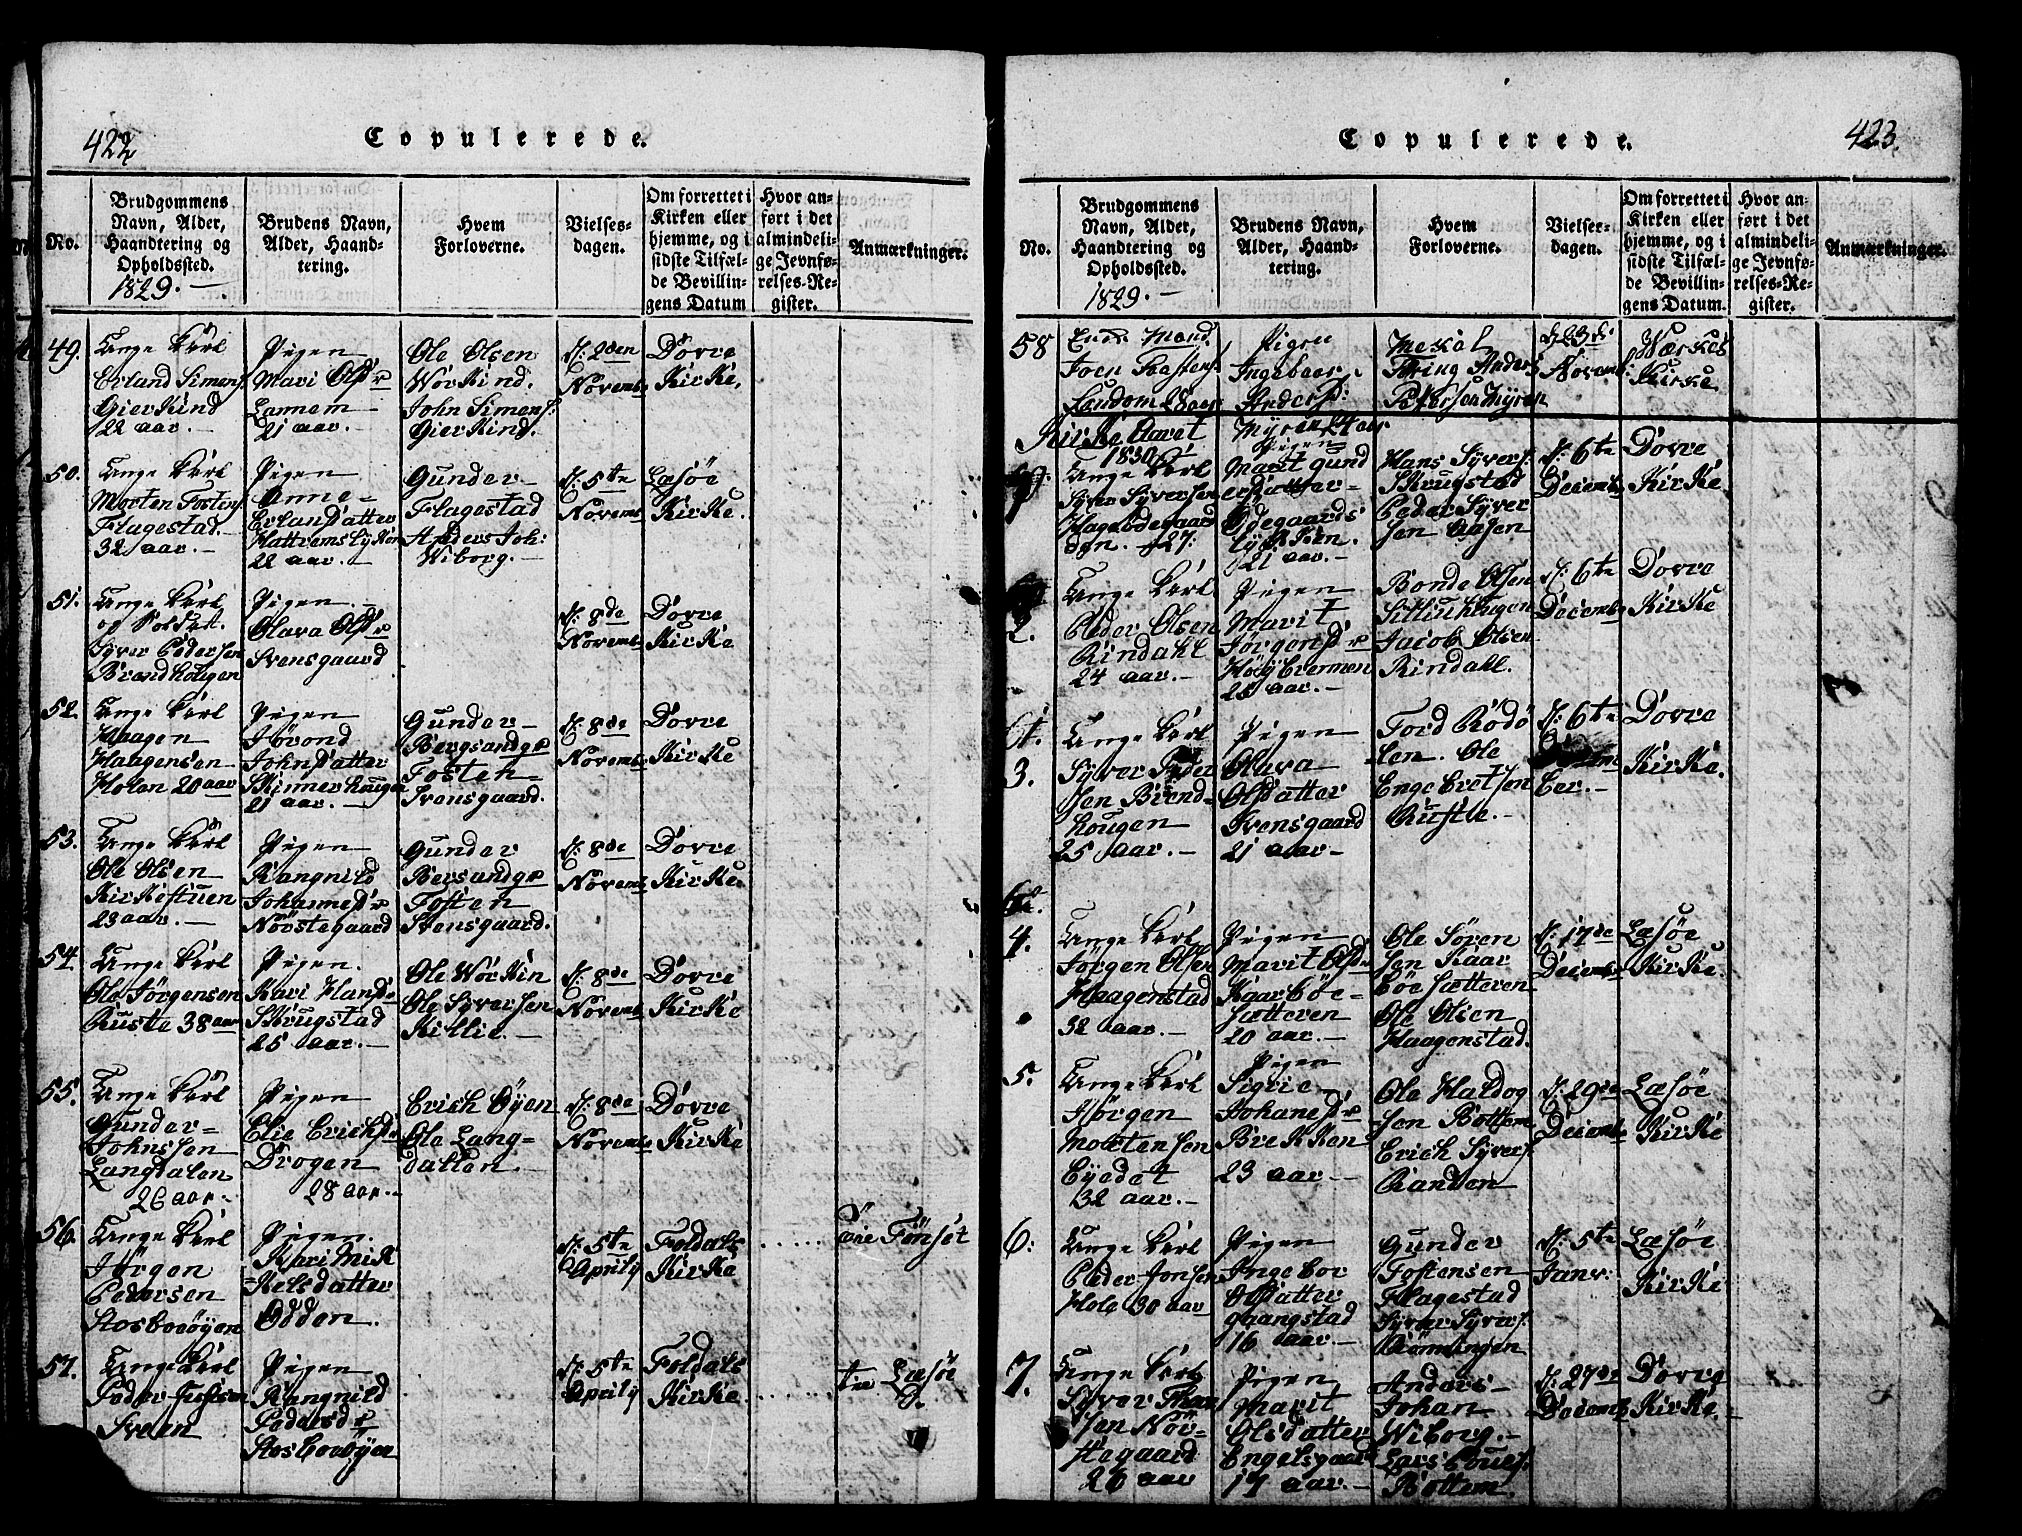 SAH, Lesja prestekontor, Klokkerbok nr. 1, 1820-1831, s. 422-423